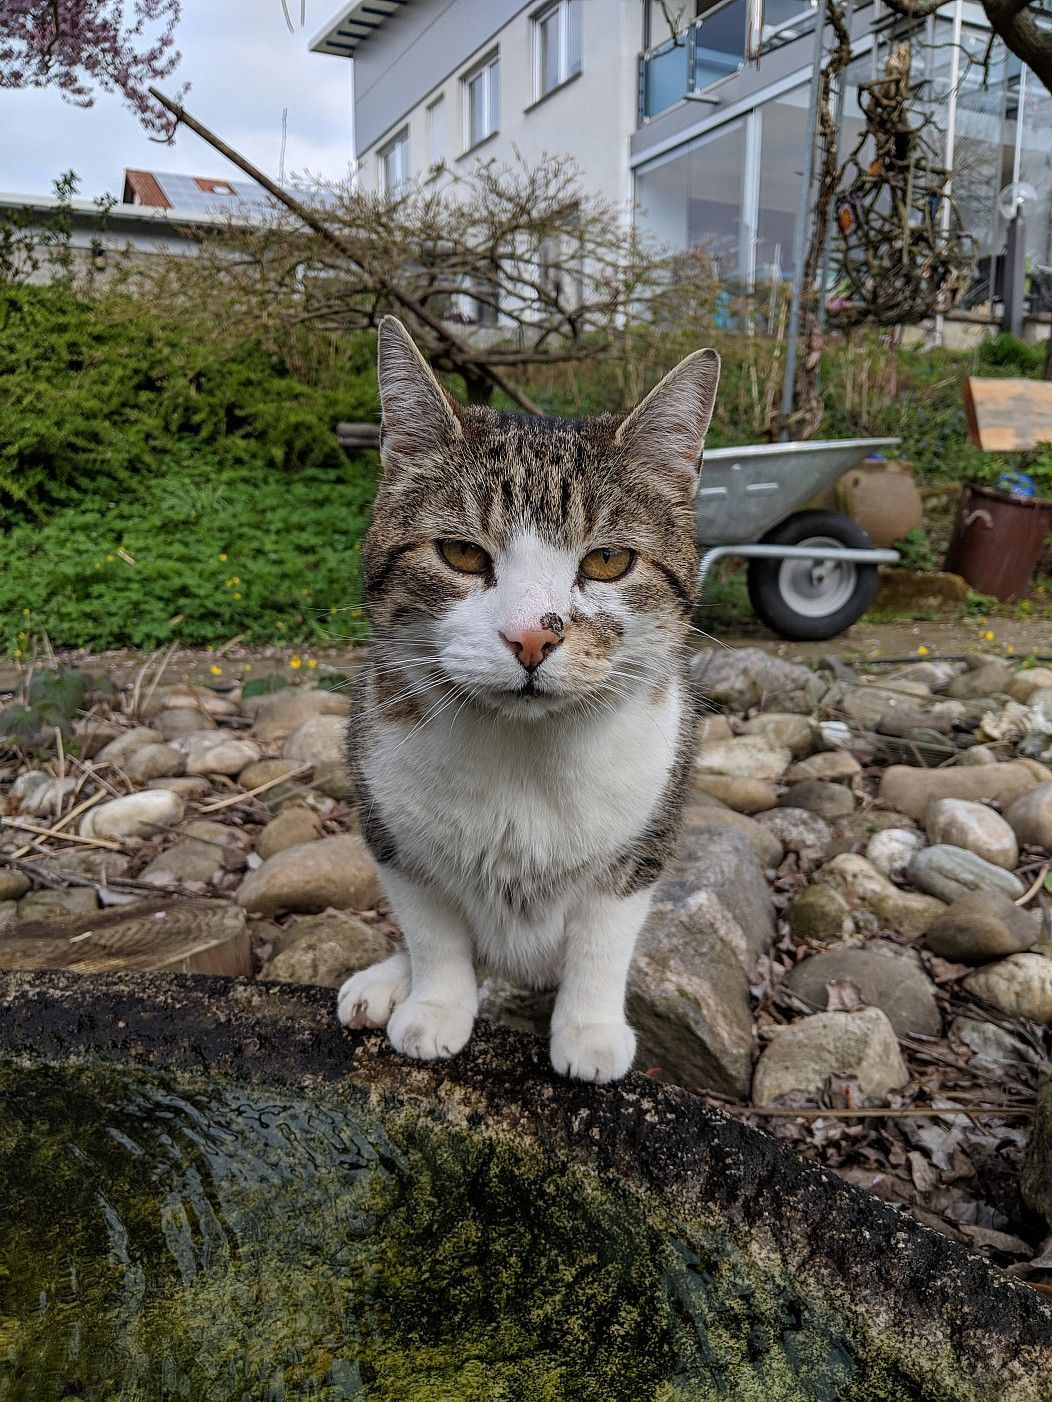 Super Cute Cat On The Streets Streetcat Cutie Feline Domestic Cat Cats Kitten Care